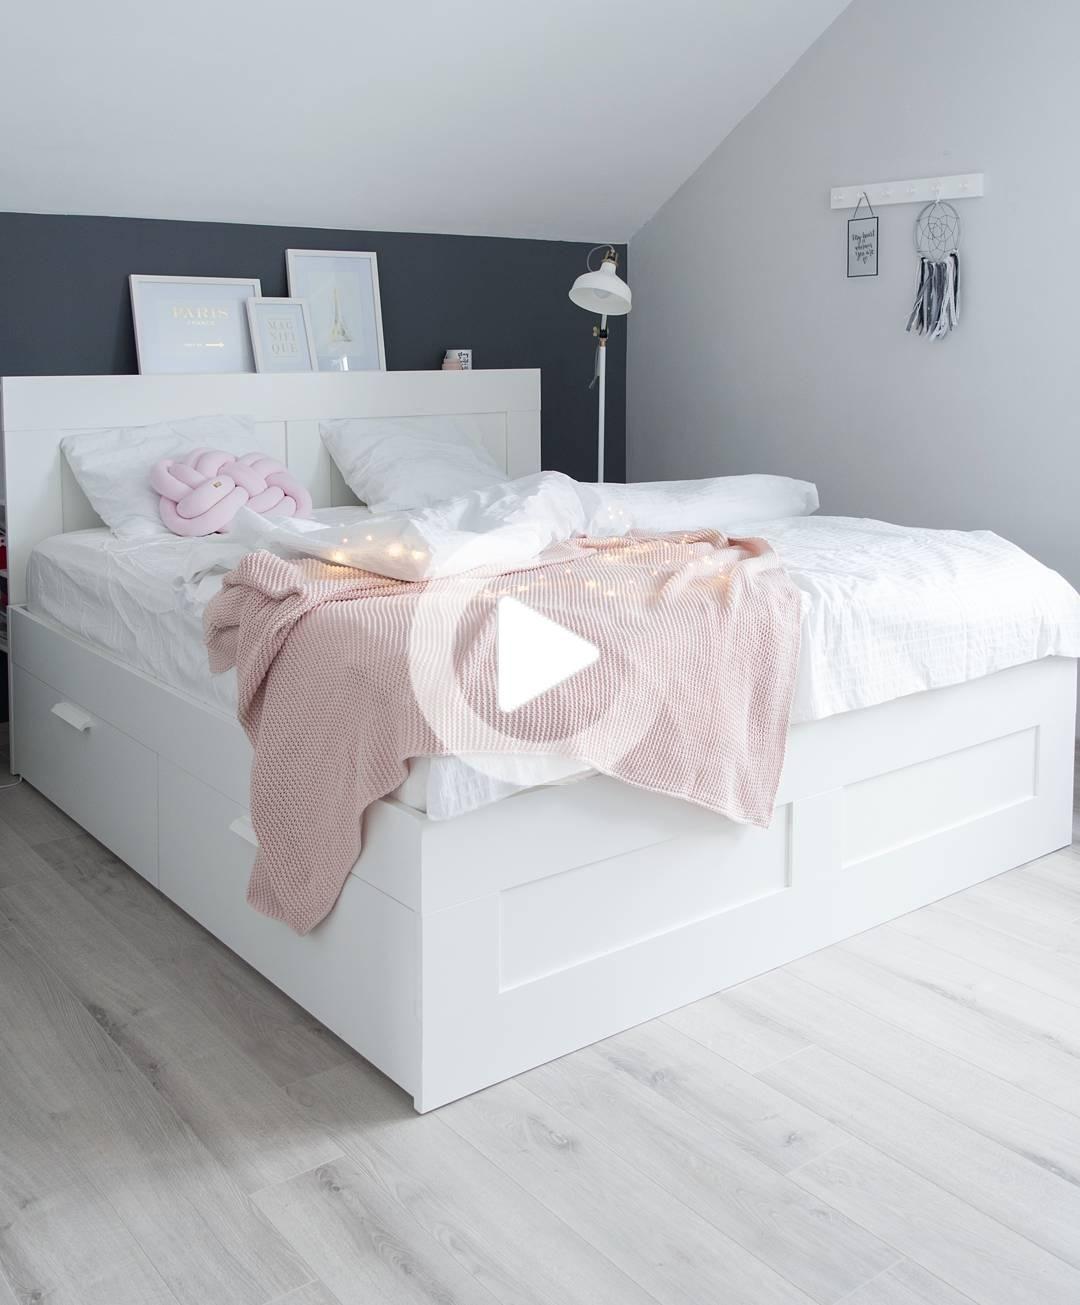 Kissen Kissenhullen Inletts Online Kaufen Westwingnow In 2020 Brimnes Bett Ikea Bett Kopfteil Bett